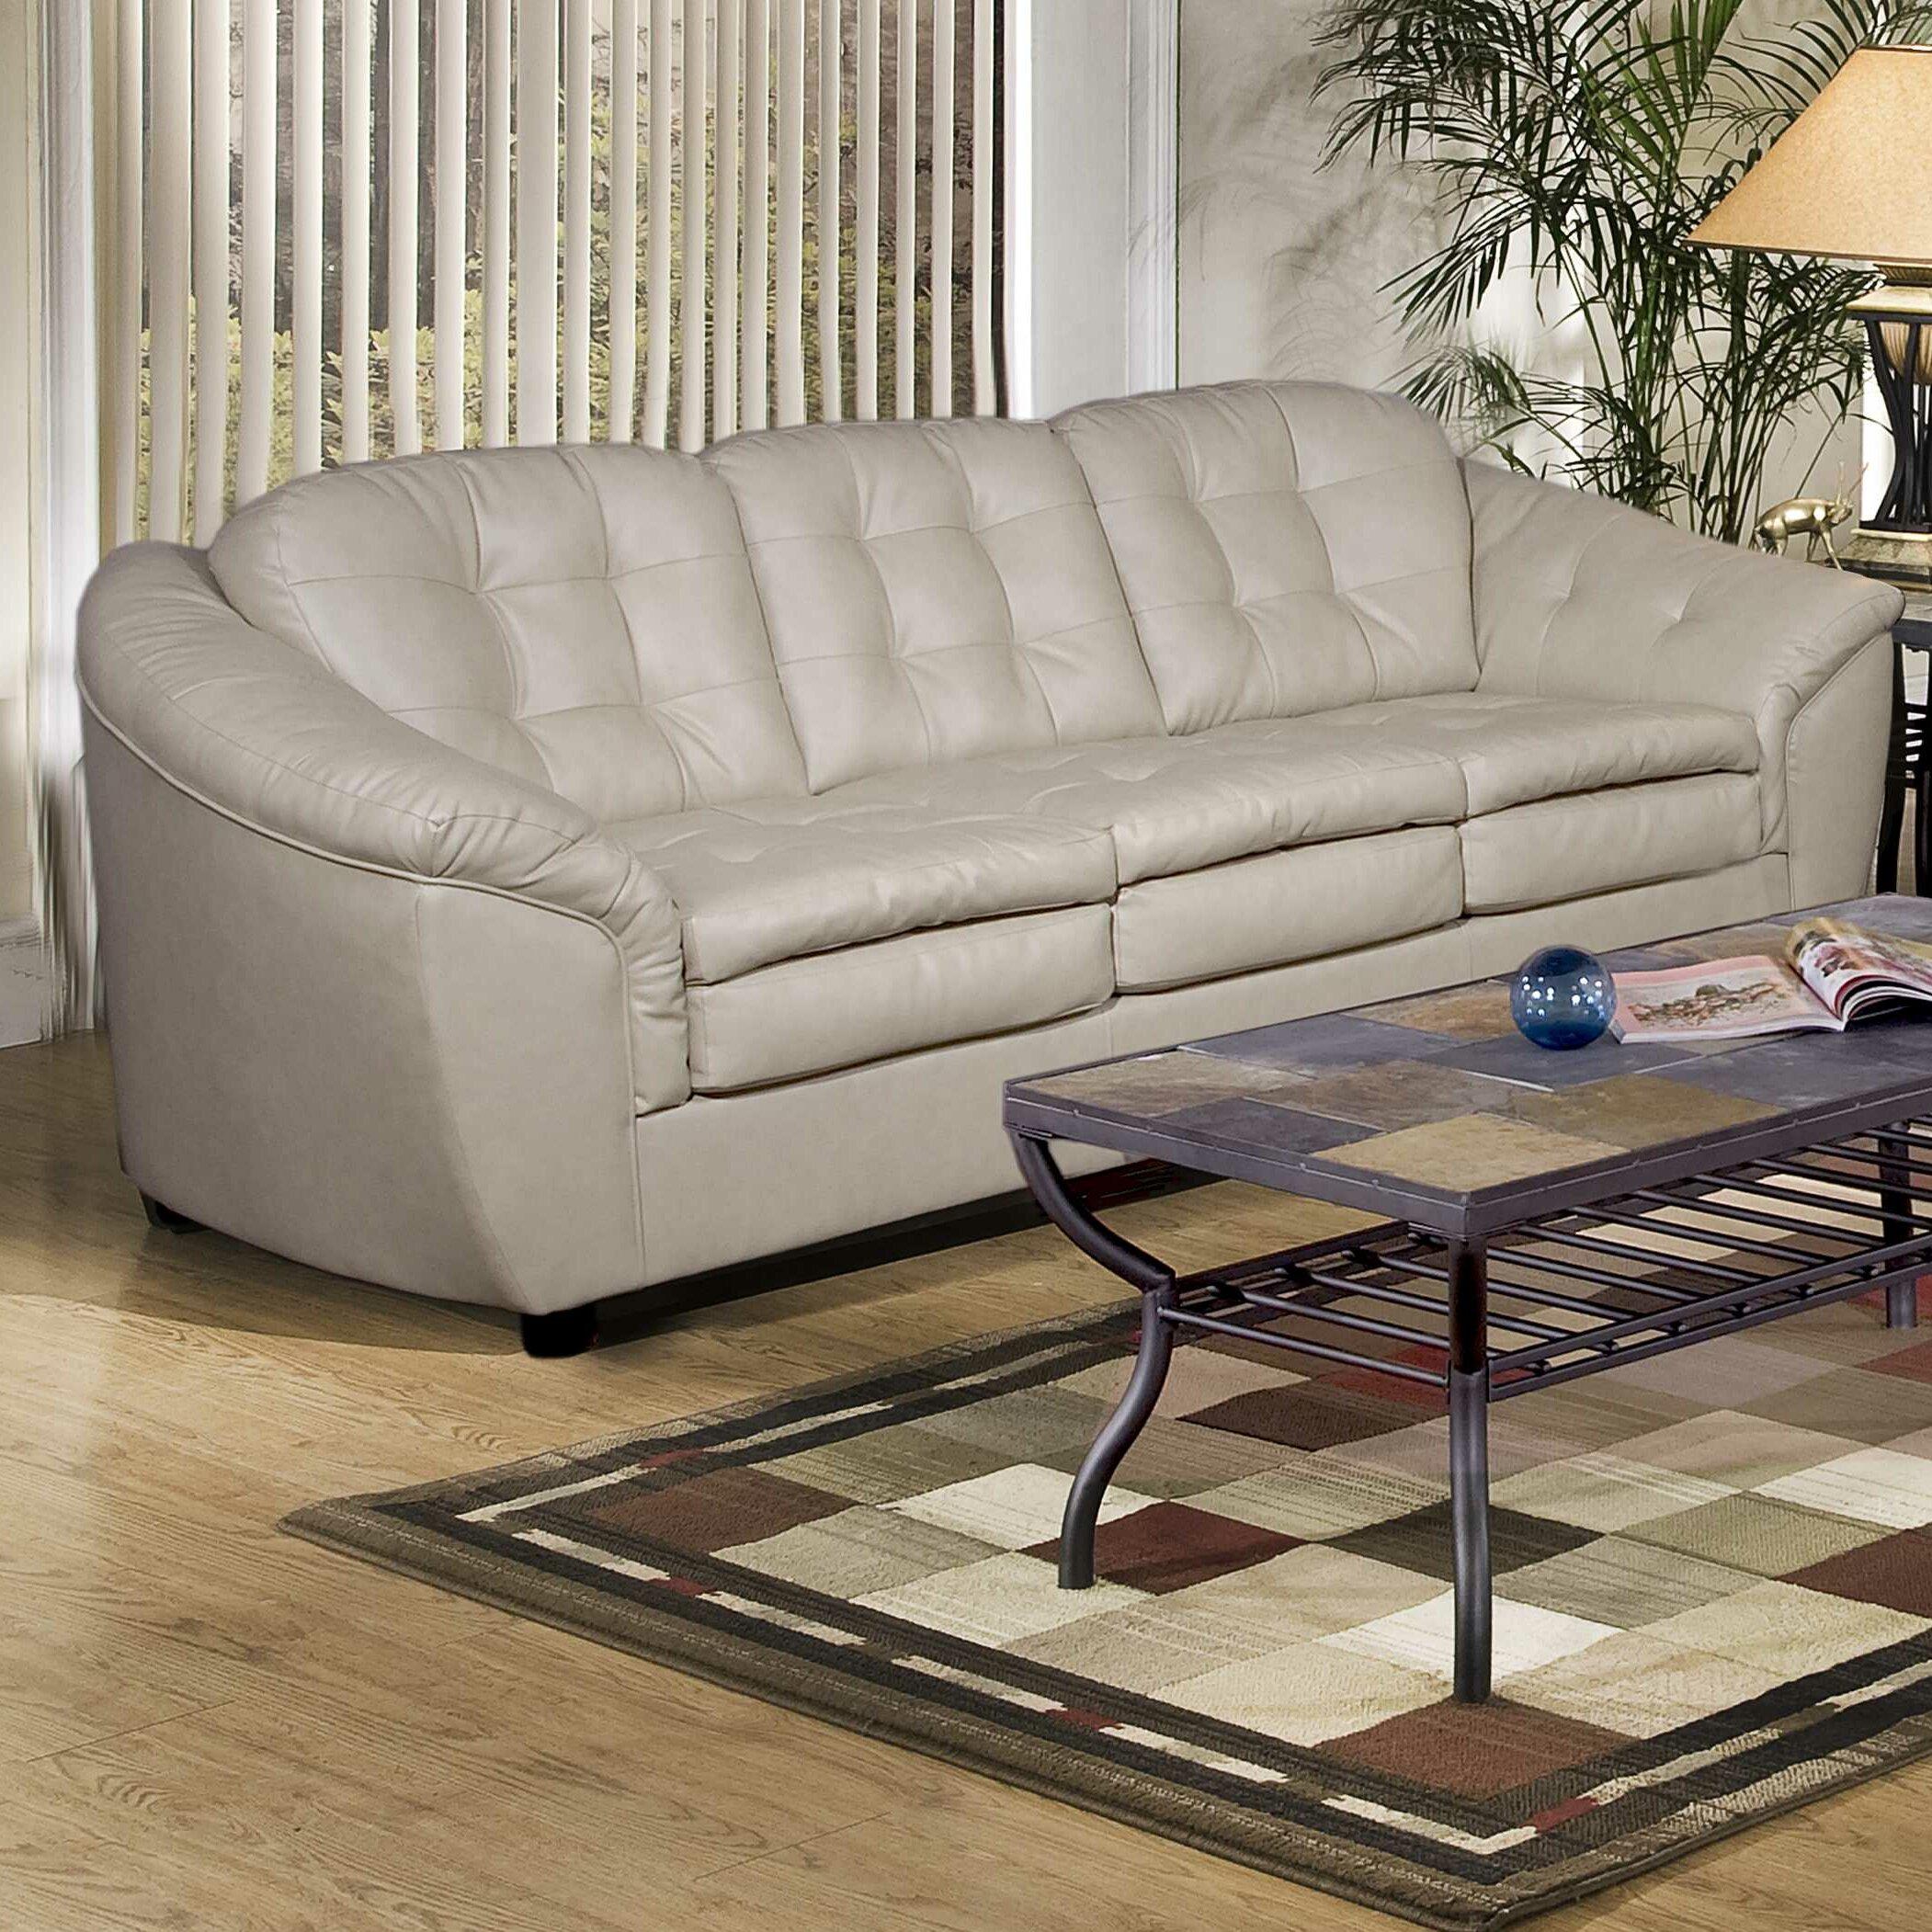 Serta Upholstery Sofa Amp Reviews Wayfair